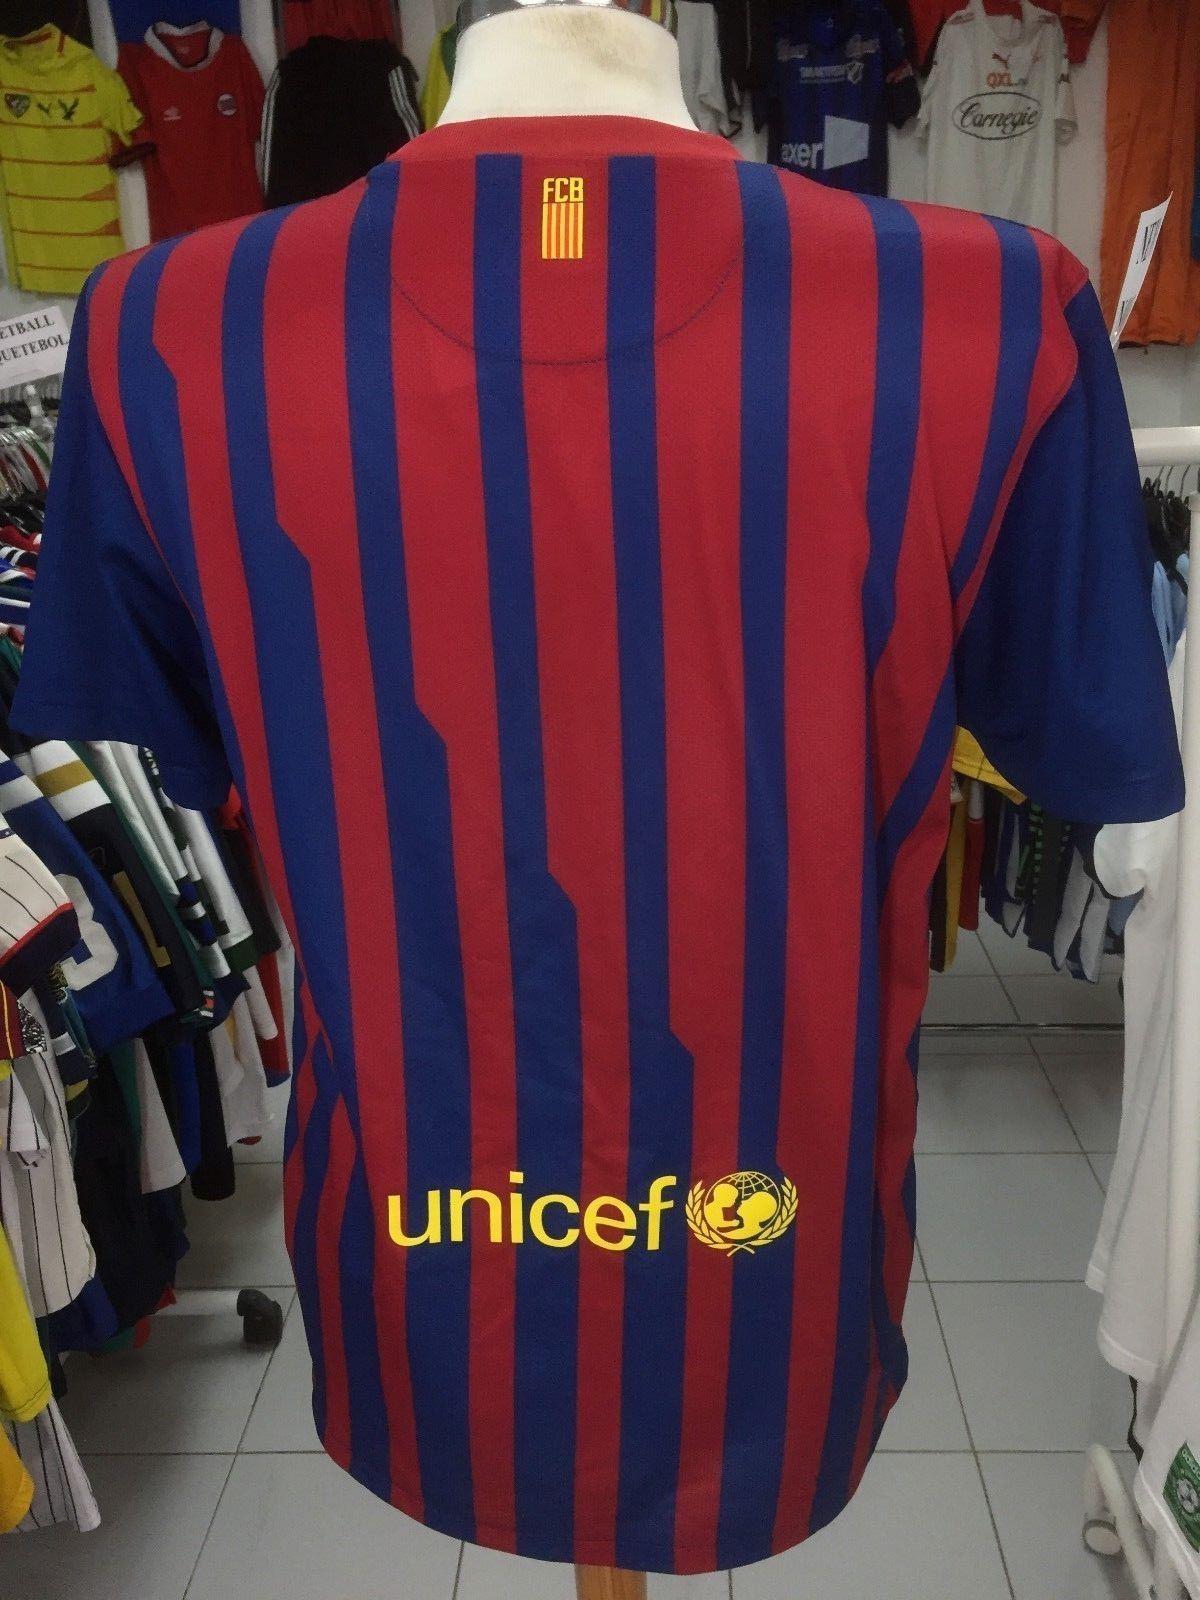 80c745988be ... Jersey FC Barcelona 2011 12 (M) Home FCB Catalunya Nike Shirt Camiseta  Maglia ...